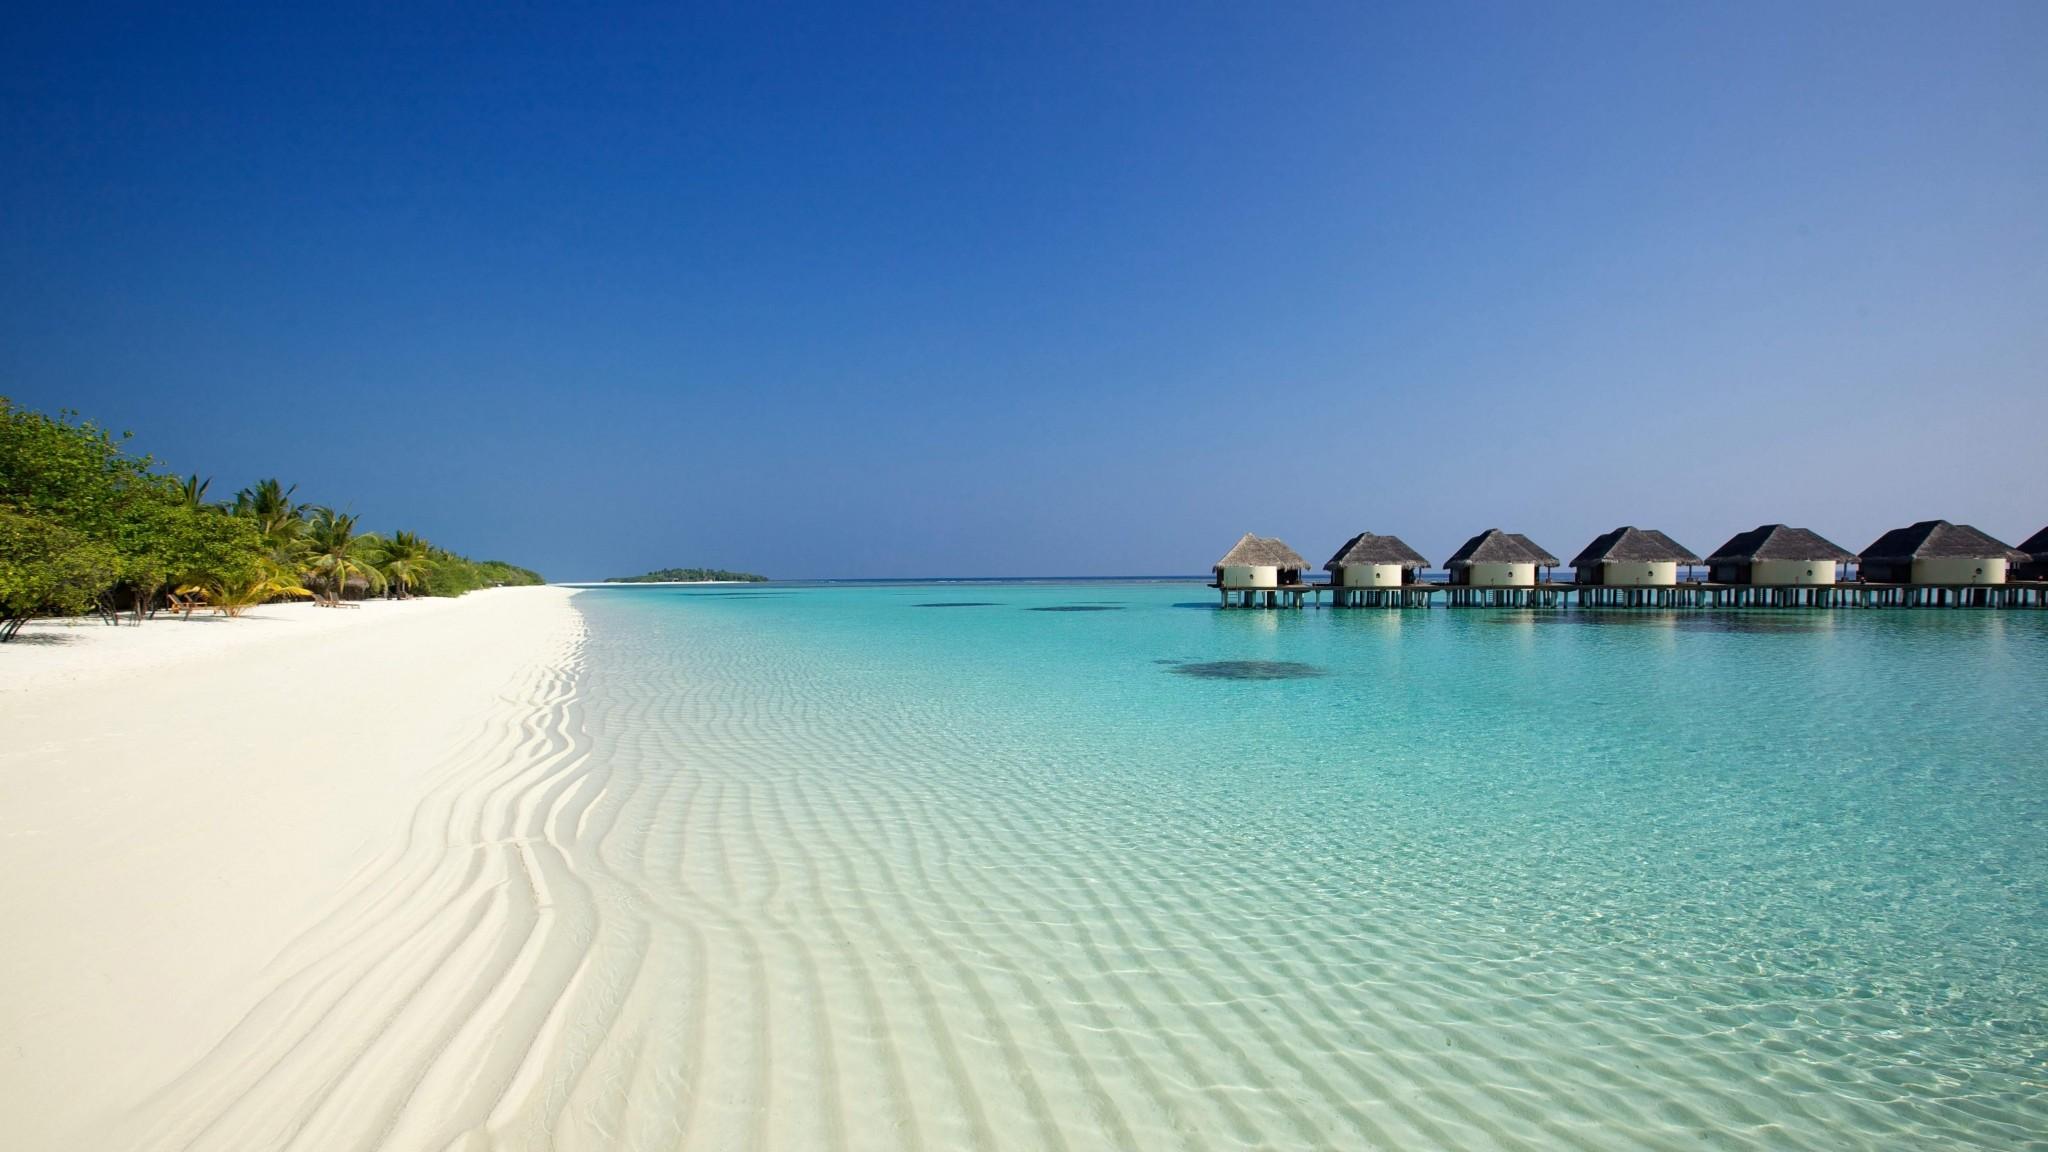 Preview wallpaper beach, ocean, sand, palm trees, bungalows 2048×1152